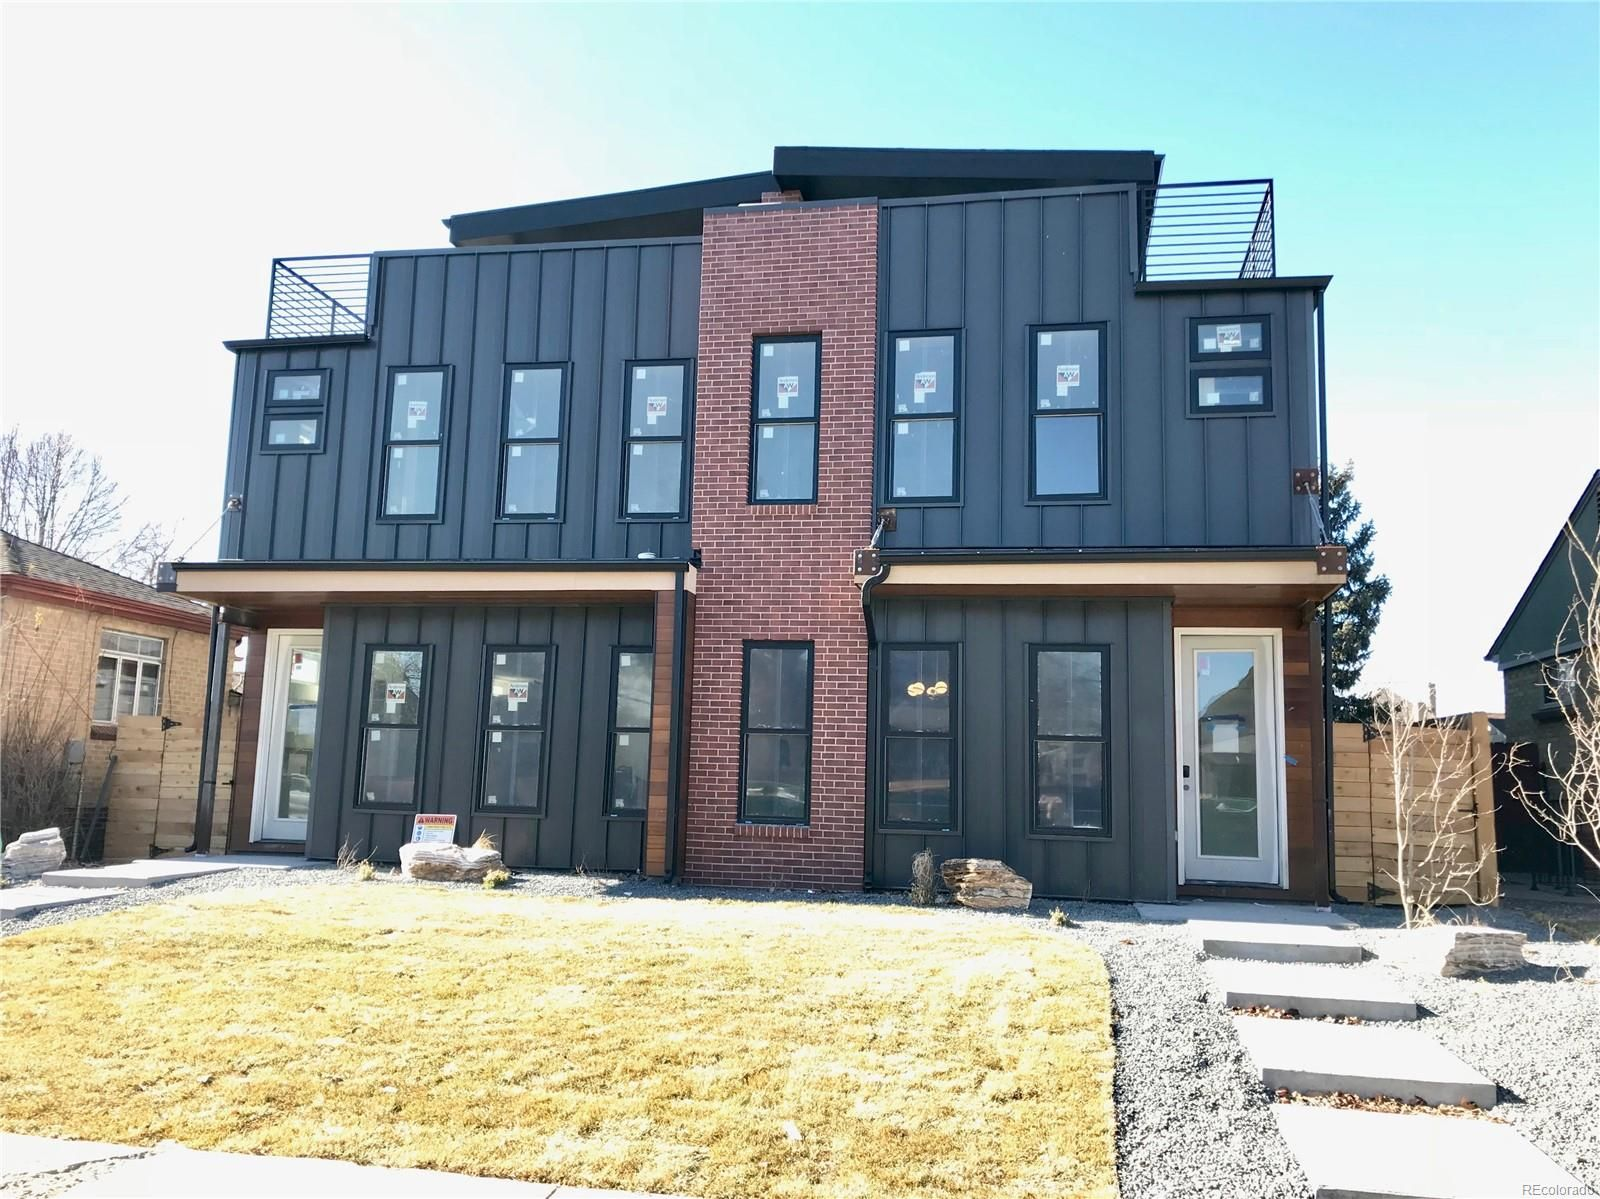 4145 Shoshone St, Denver, CO 80211 - Recently Sold | Trulia